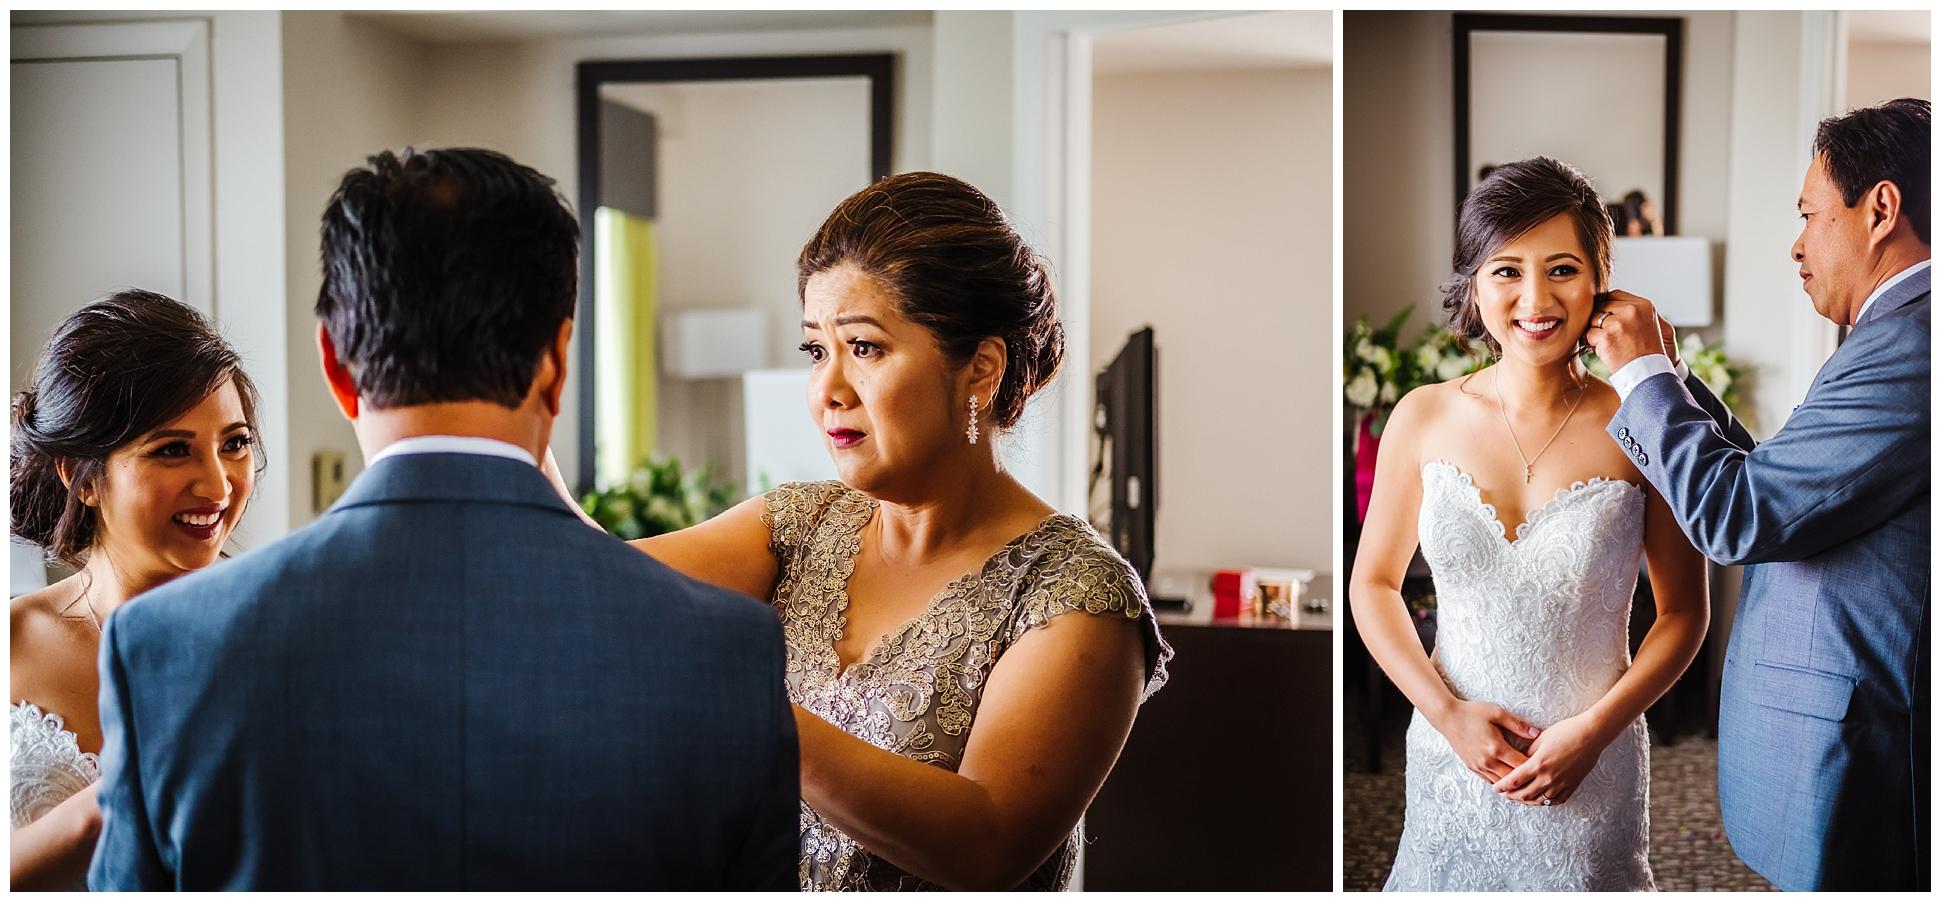 tampa-wedding-photographer-philipino-colorful-woods-ballroom-church-mass-confetti-fuscia_0013.jpg